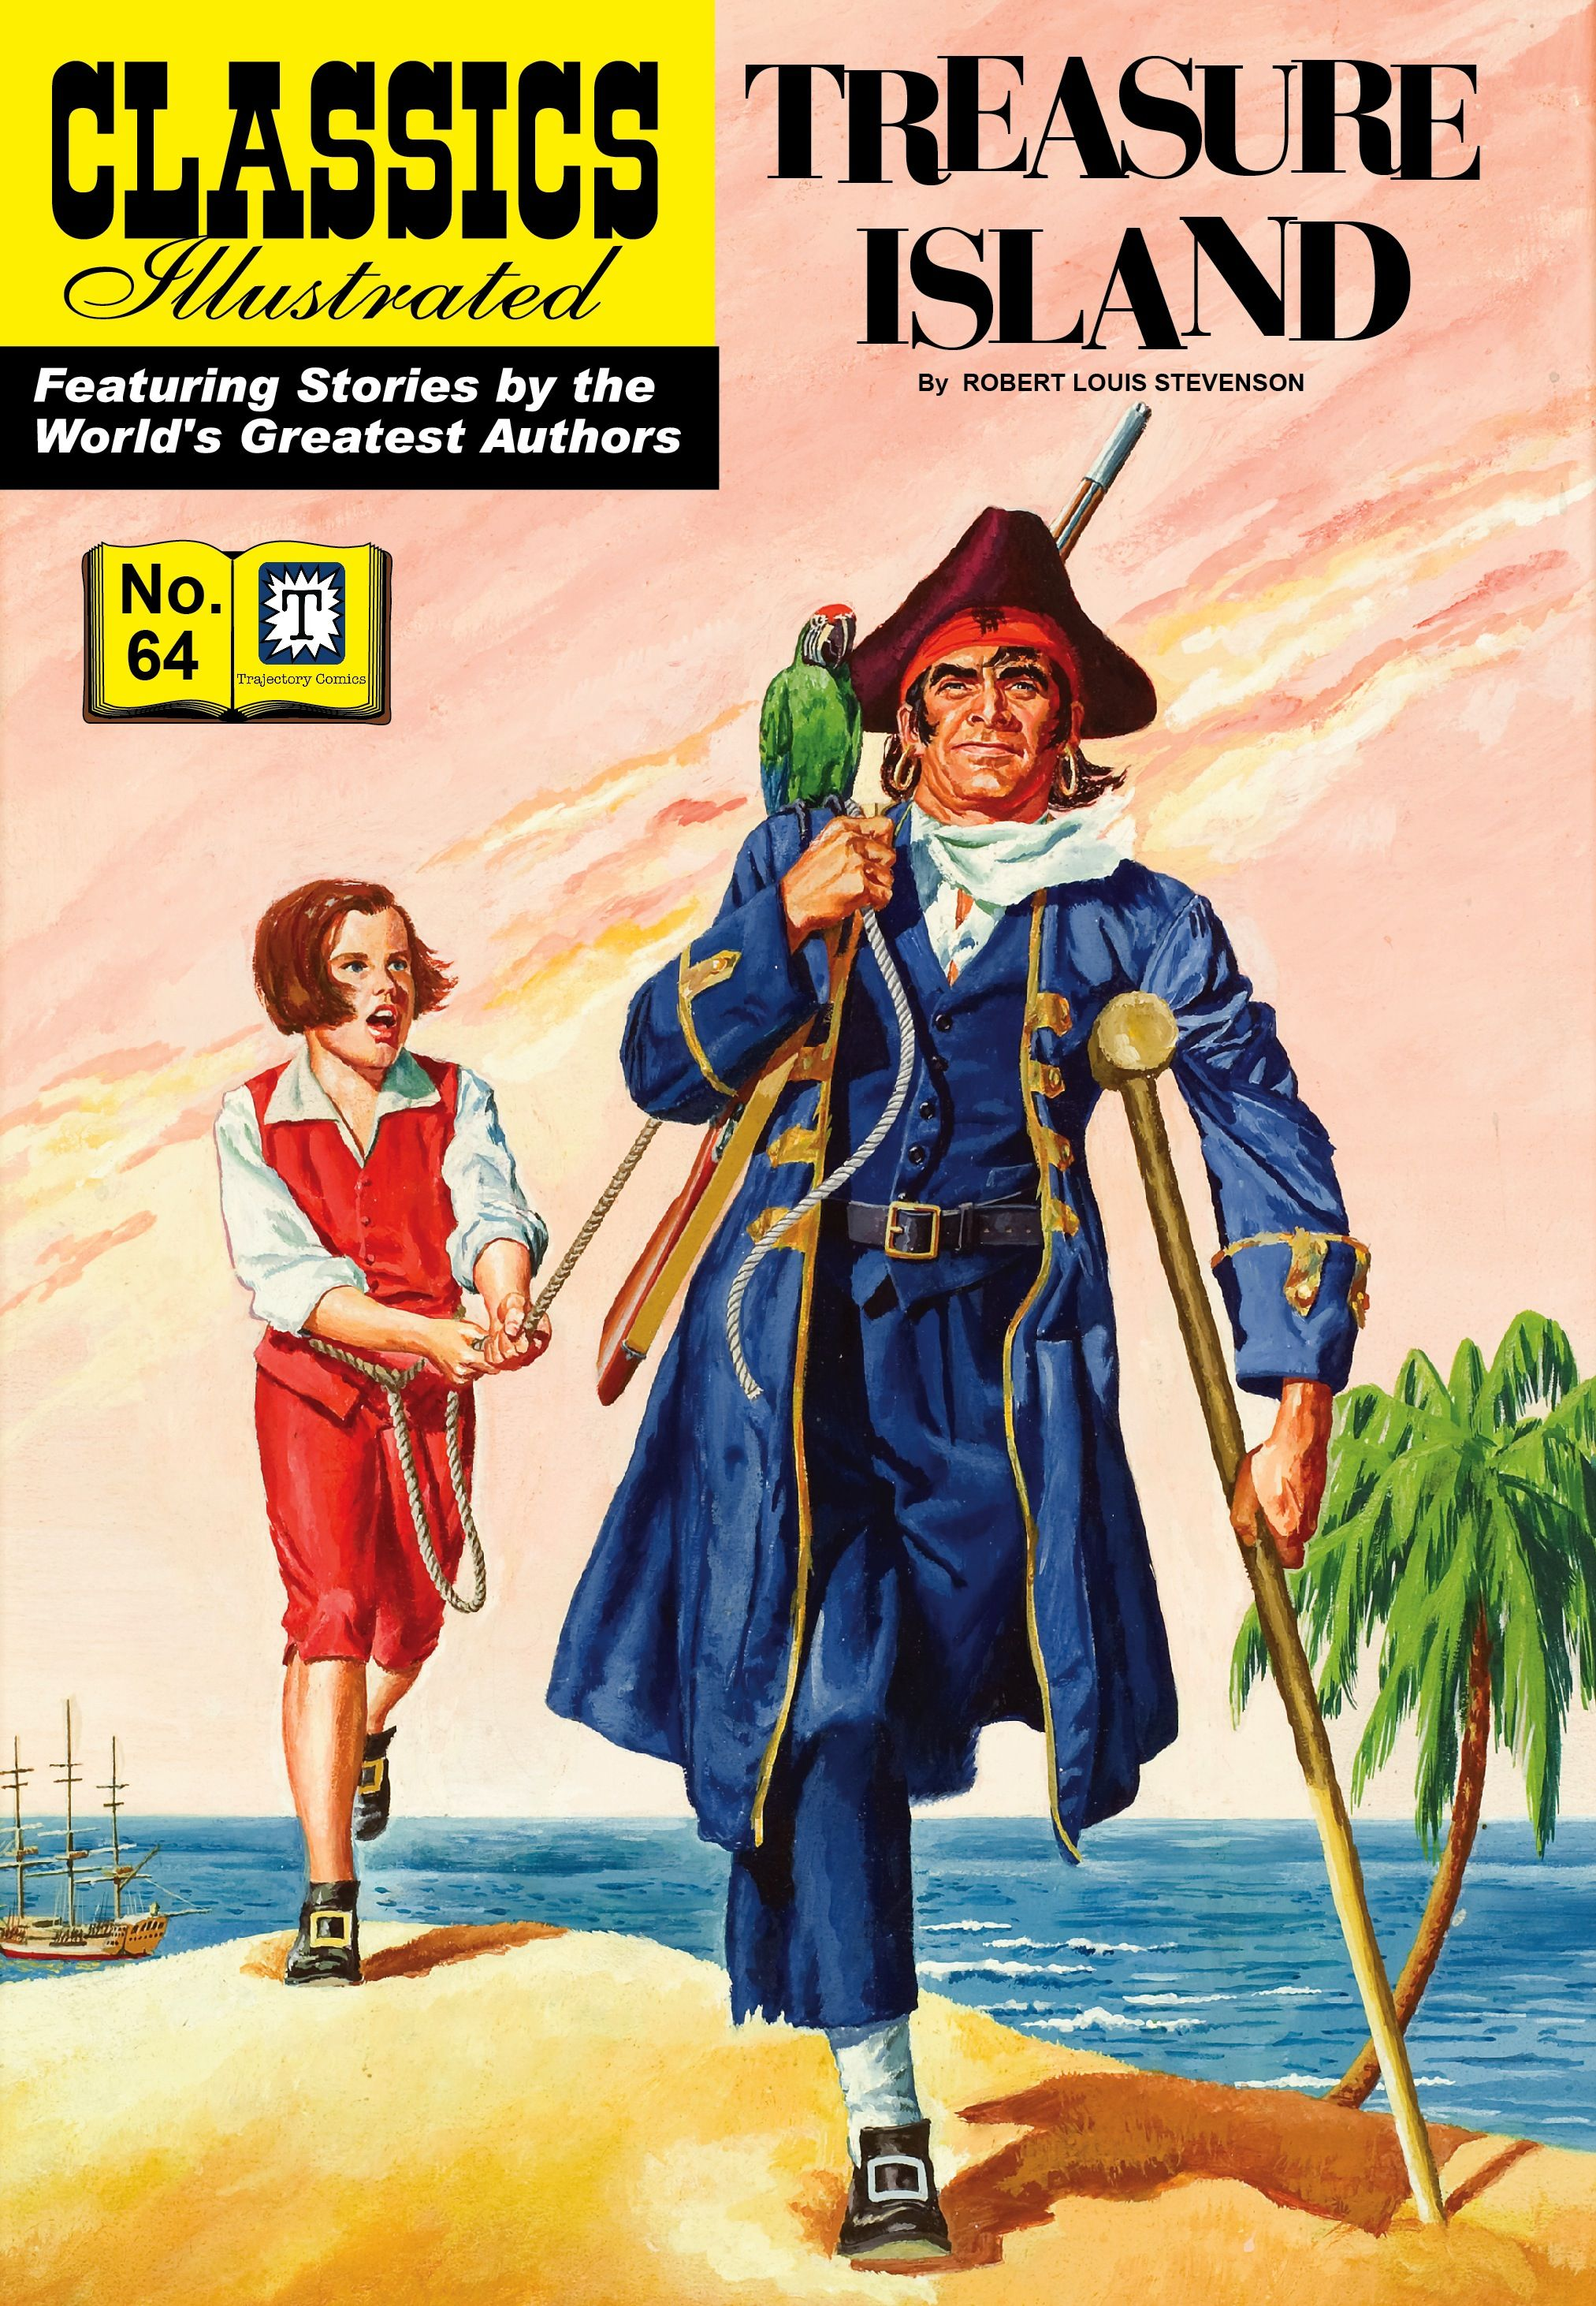 Classic Illustrated Comic Books